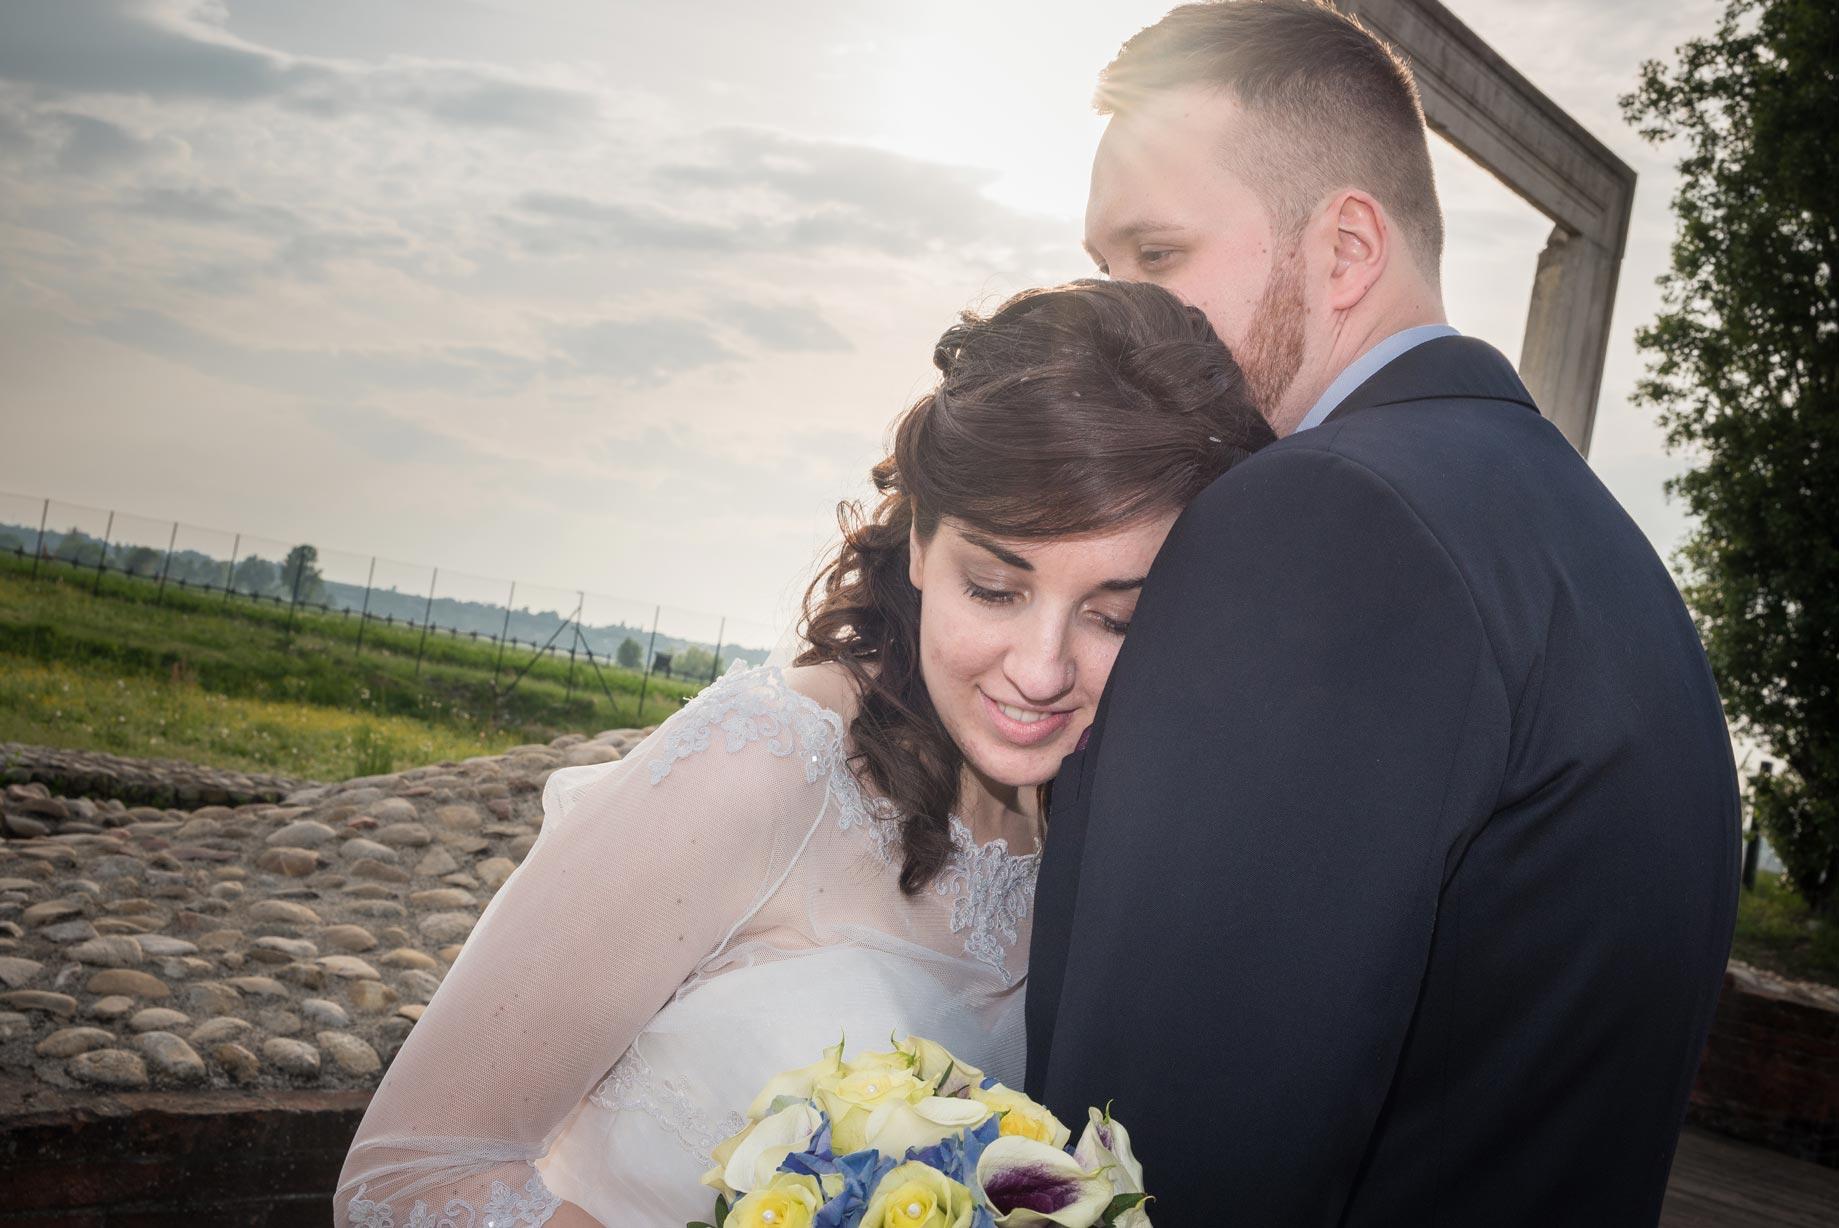 Matrimonio a Narzole Lorenza Diego - DSC 3233 - Fotografie matrimonio al tramonto - Fotografie matrimonio al tramonto